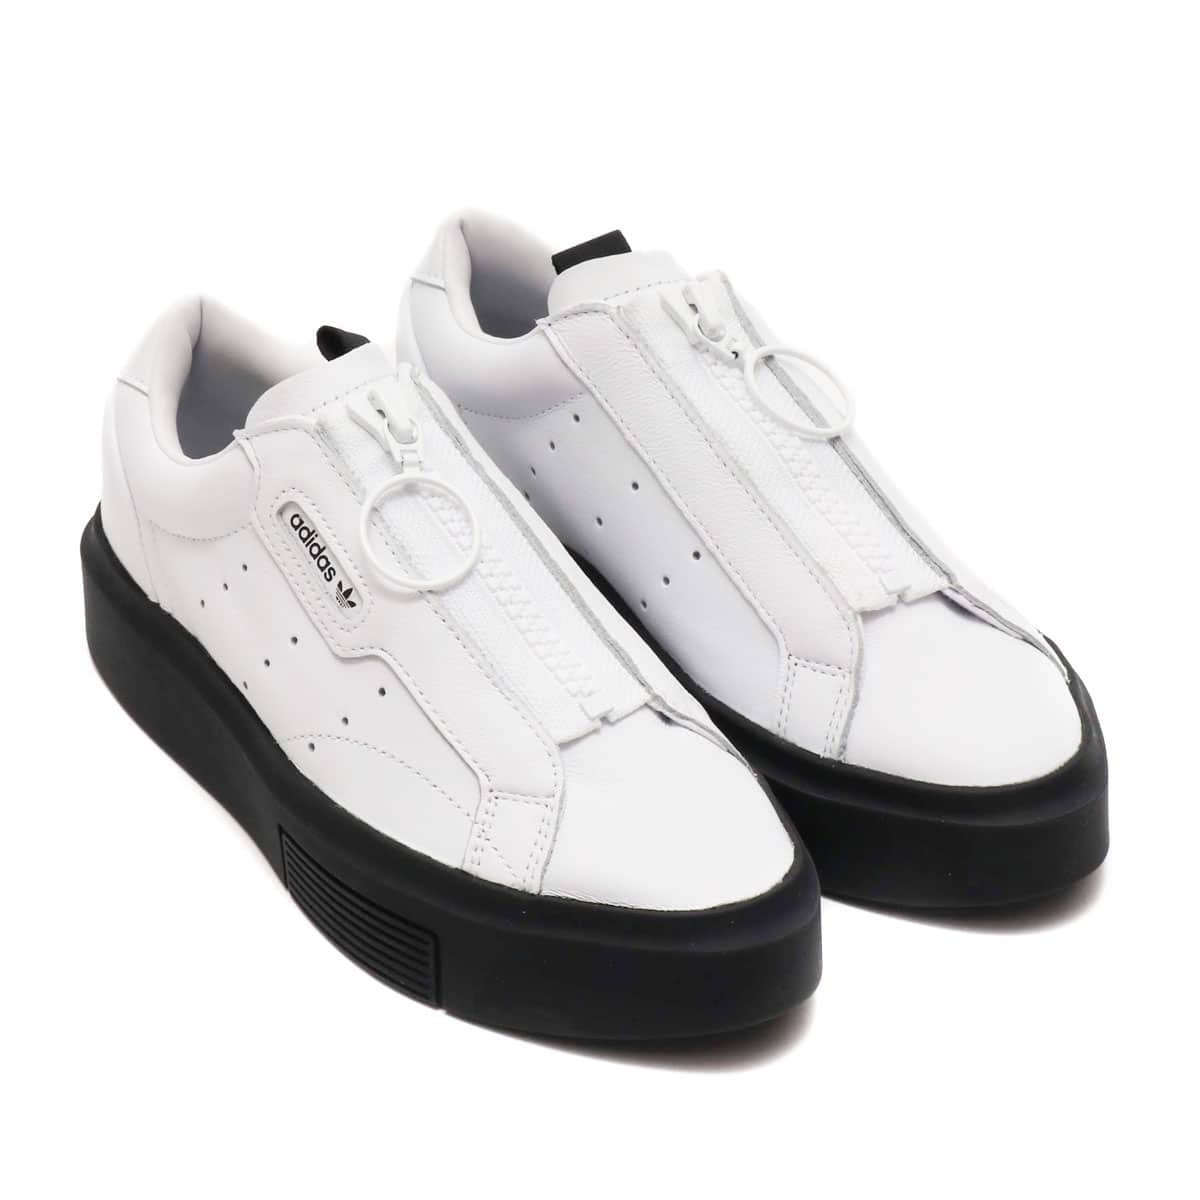 adidas Originals SLEEK SUPER Z W RUNNING WHITE/RUNNING WHITE/CORE BLACK 19FW-S_photo_large